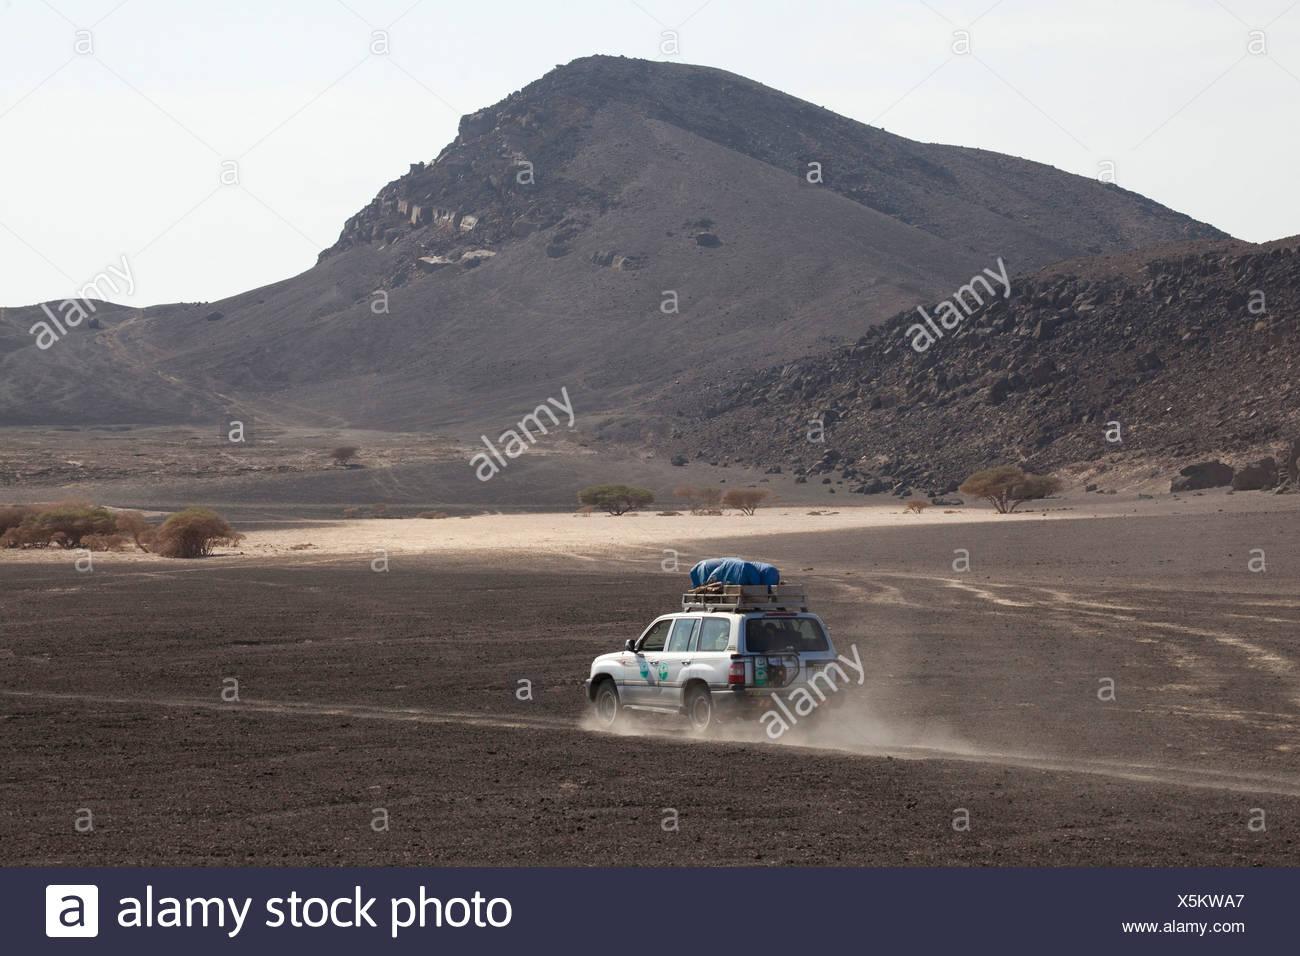 Expedición, vehículo, barco, coche, automóvil, cross-country, vehículo, erupciones, área, África, Djibouti, Imagen De Stock